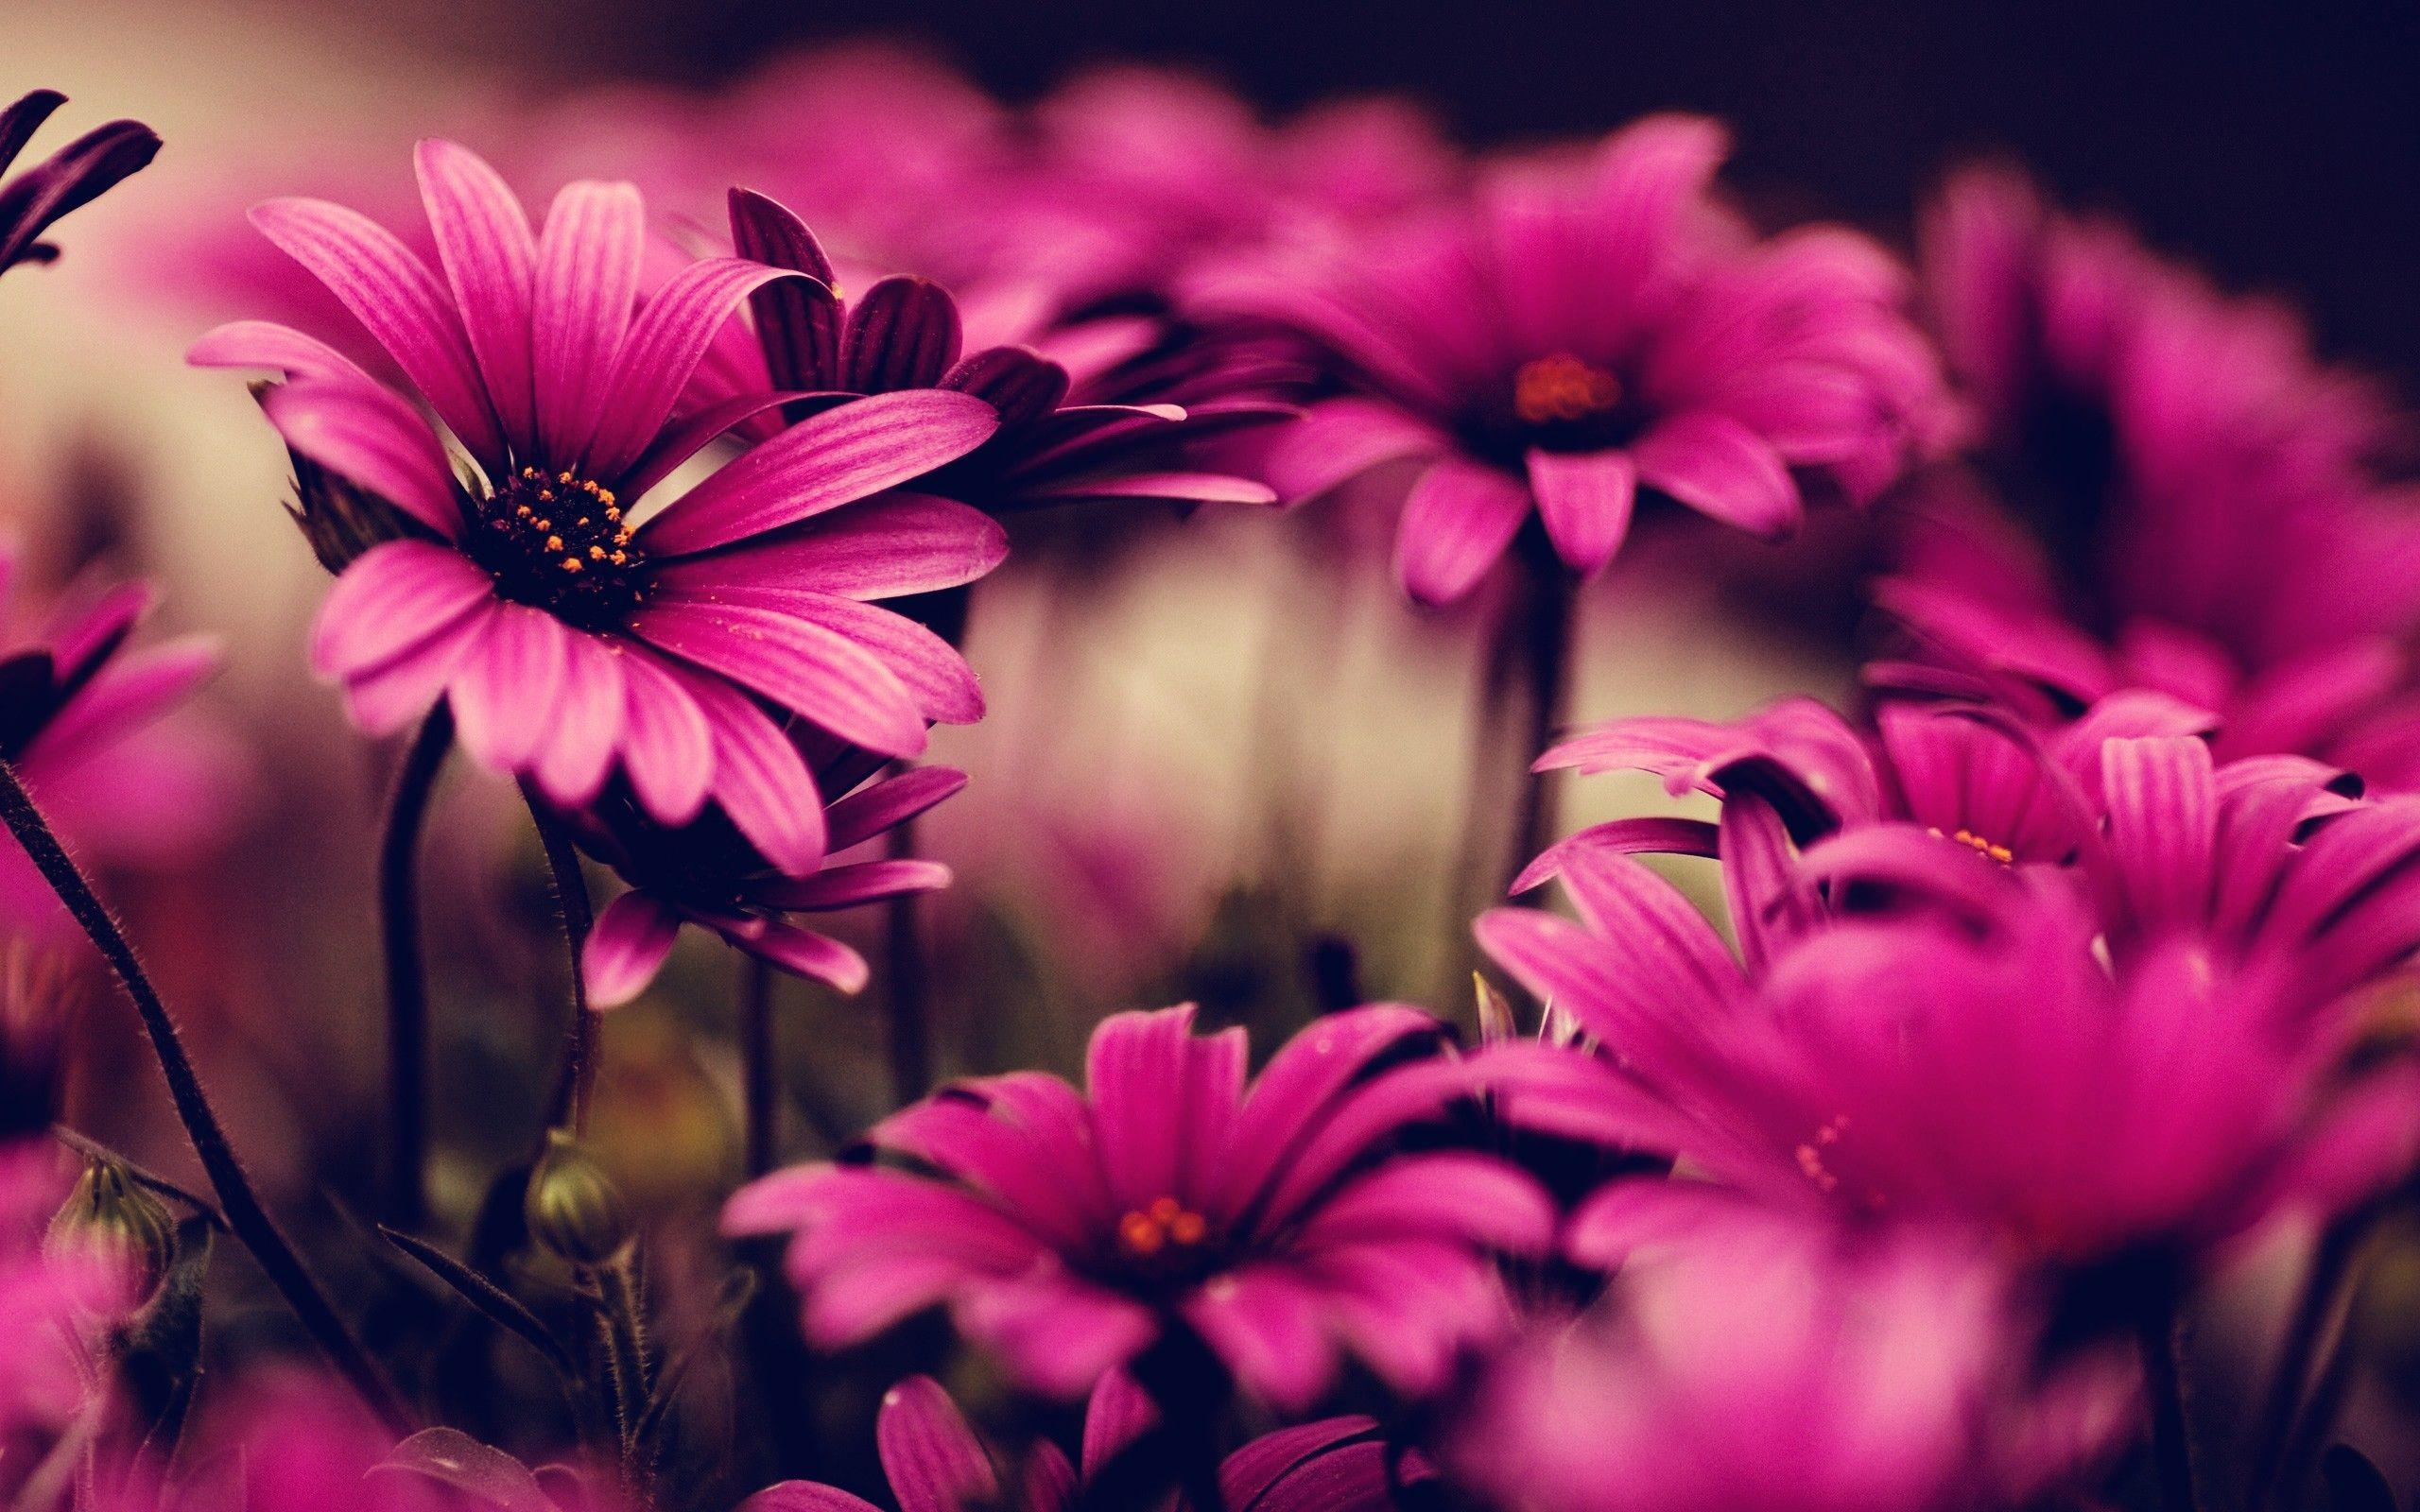 Flower Wallpaper Pink Phone